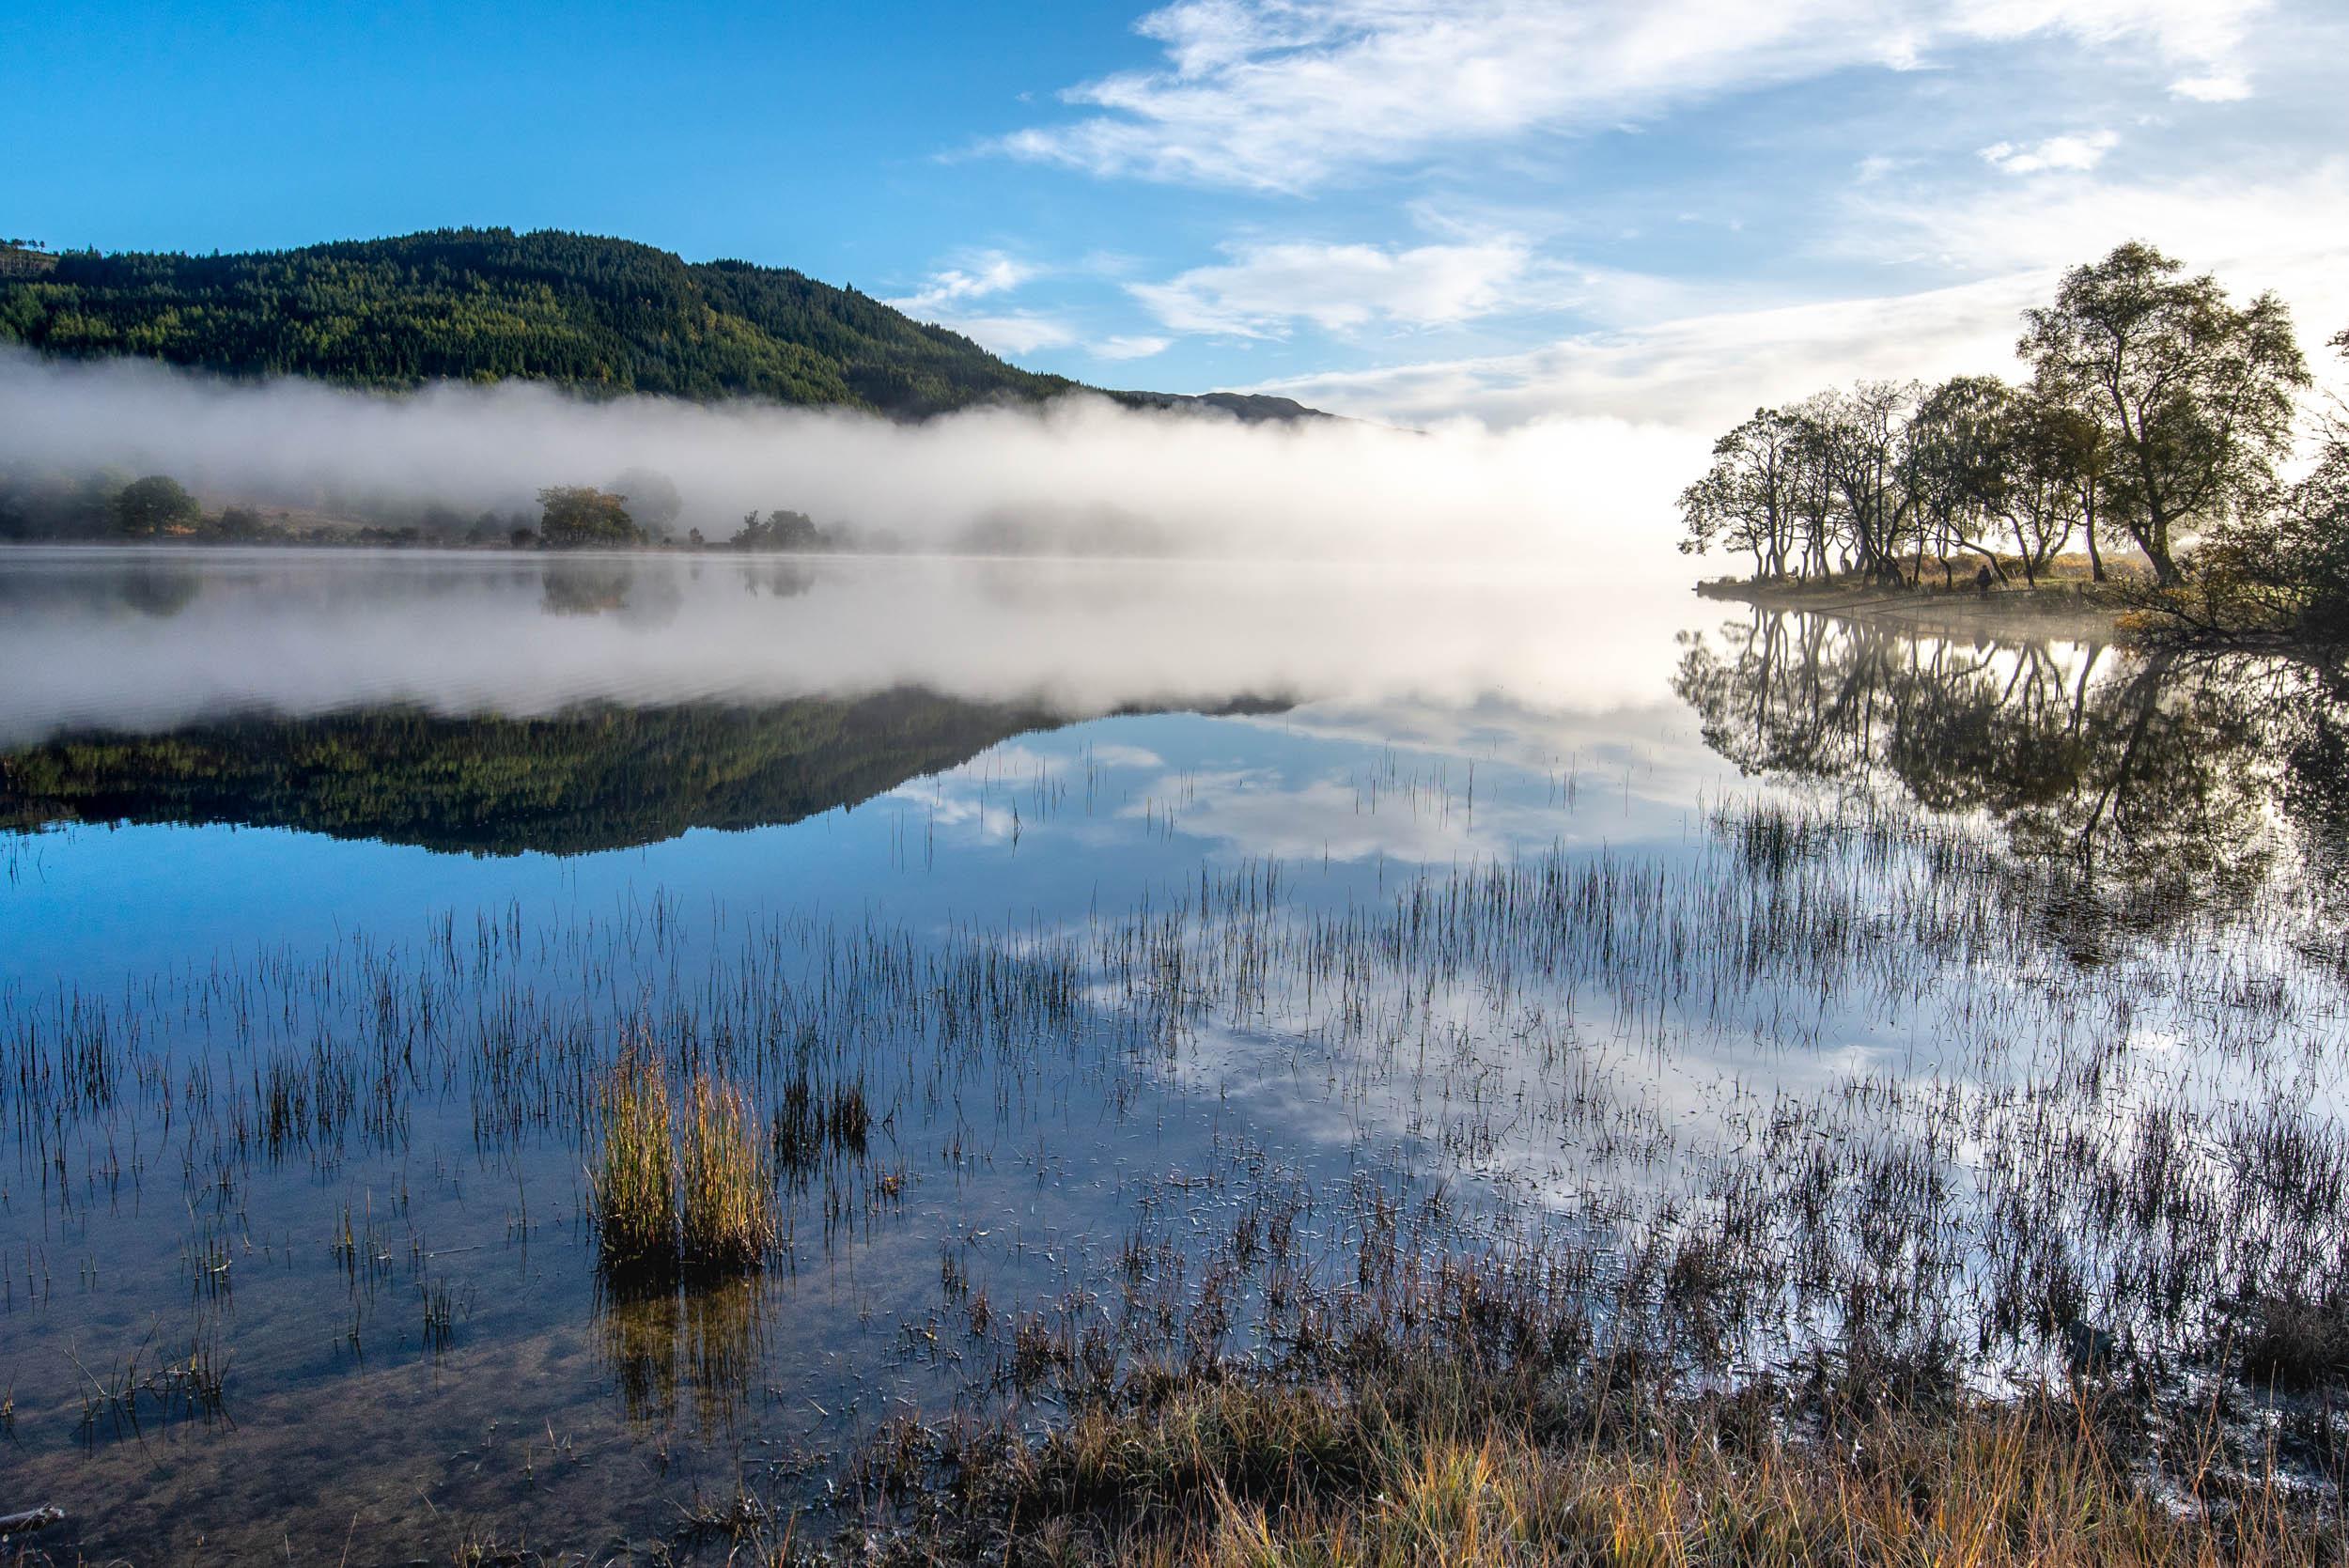 Loch-Achray-5723.jpg